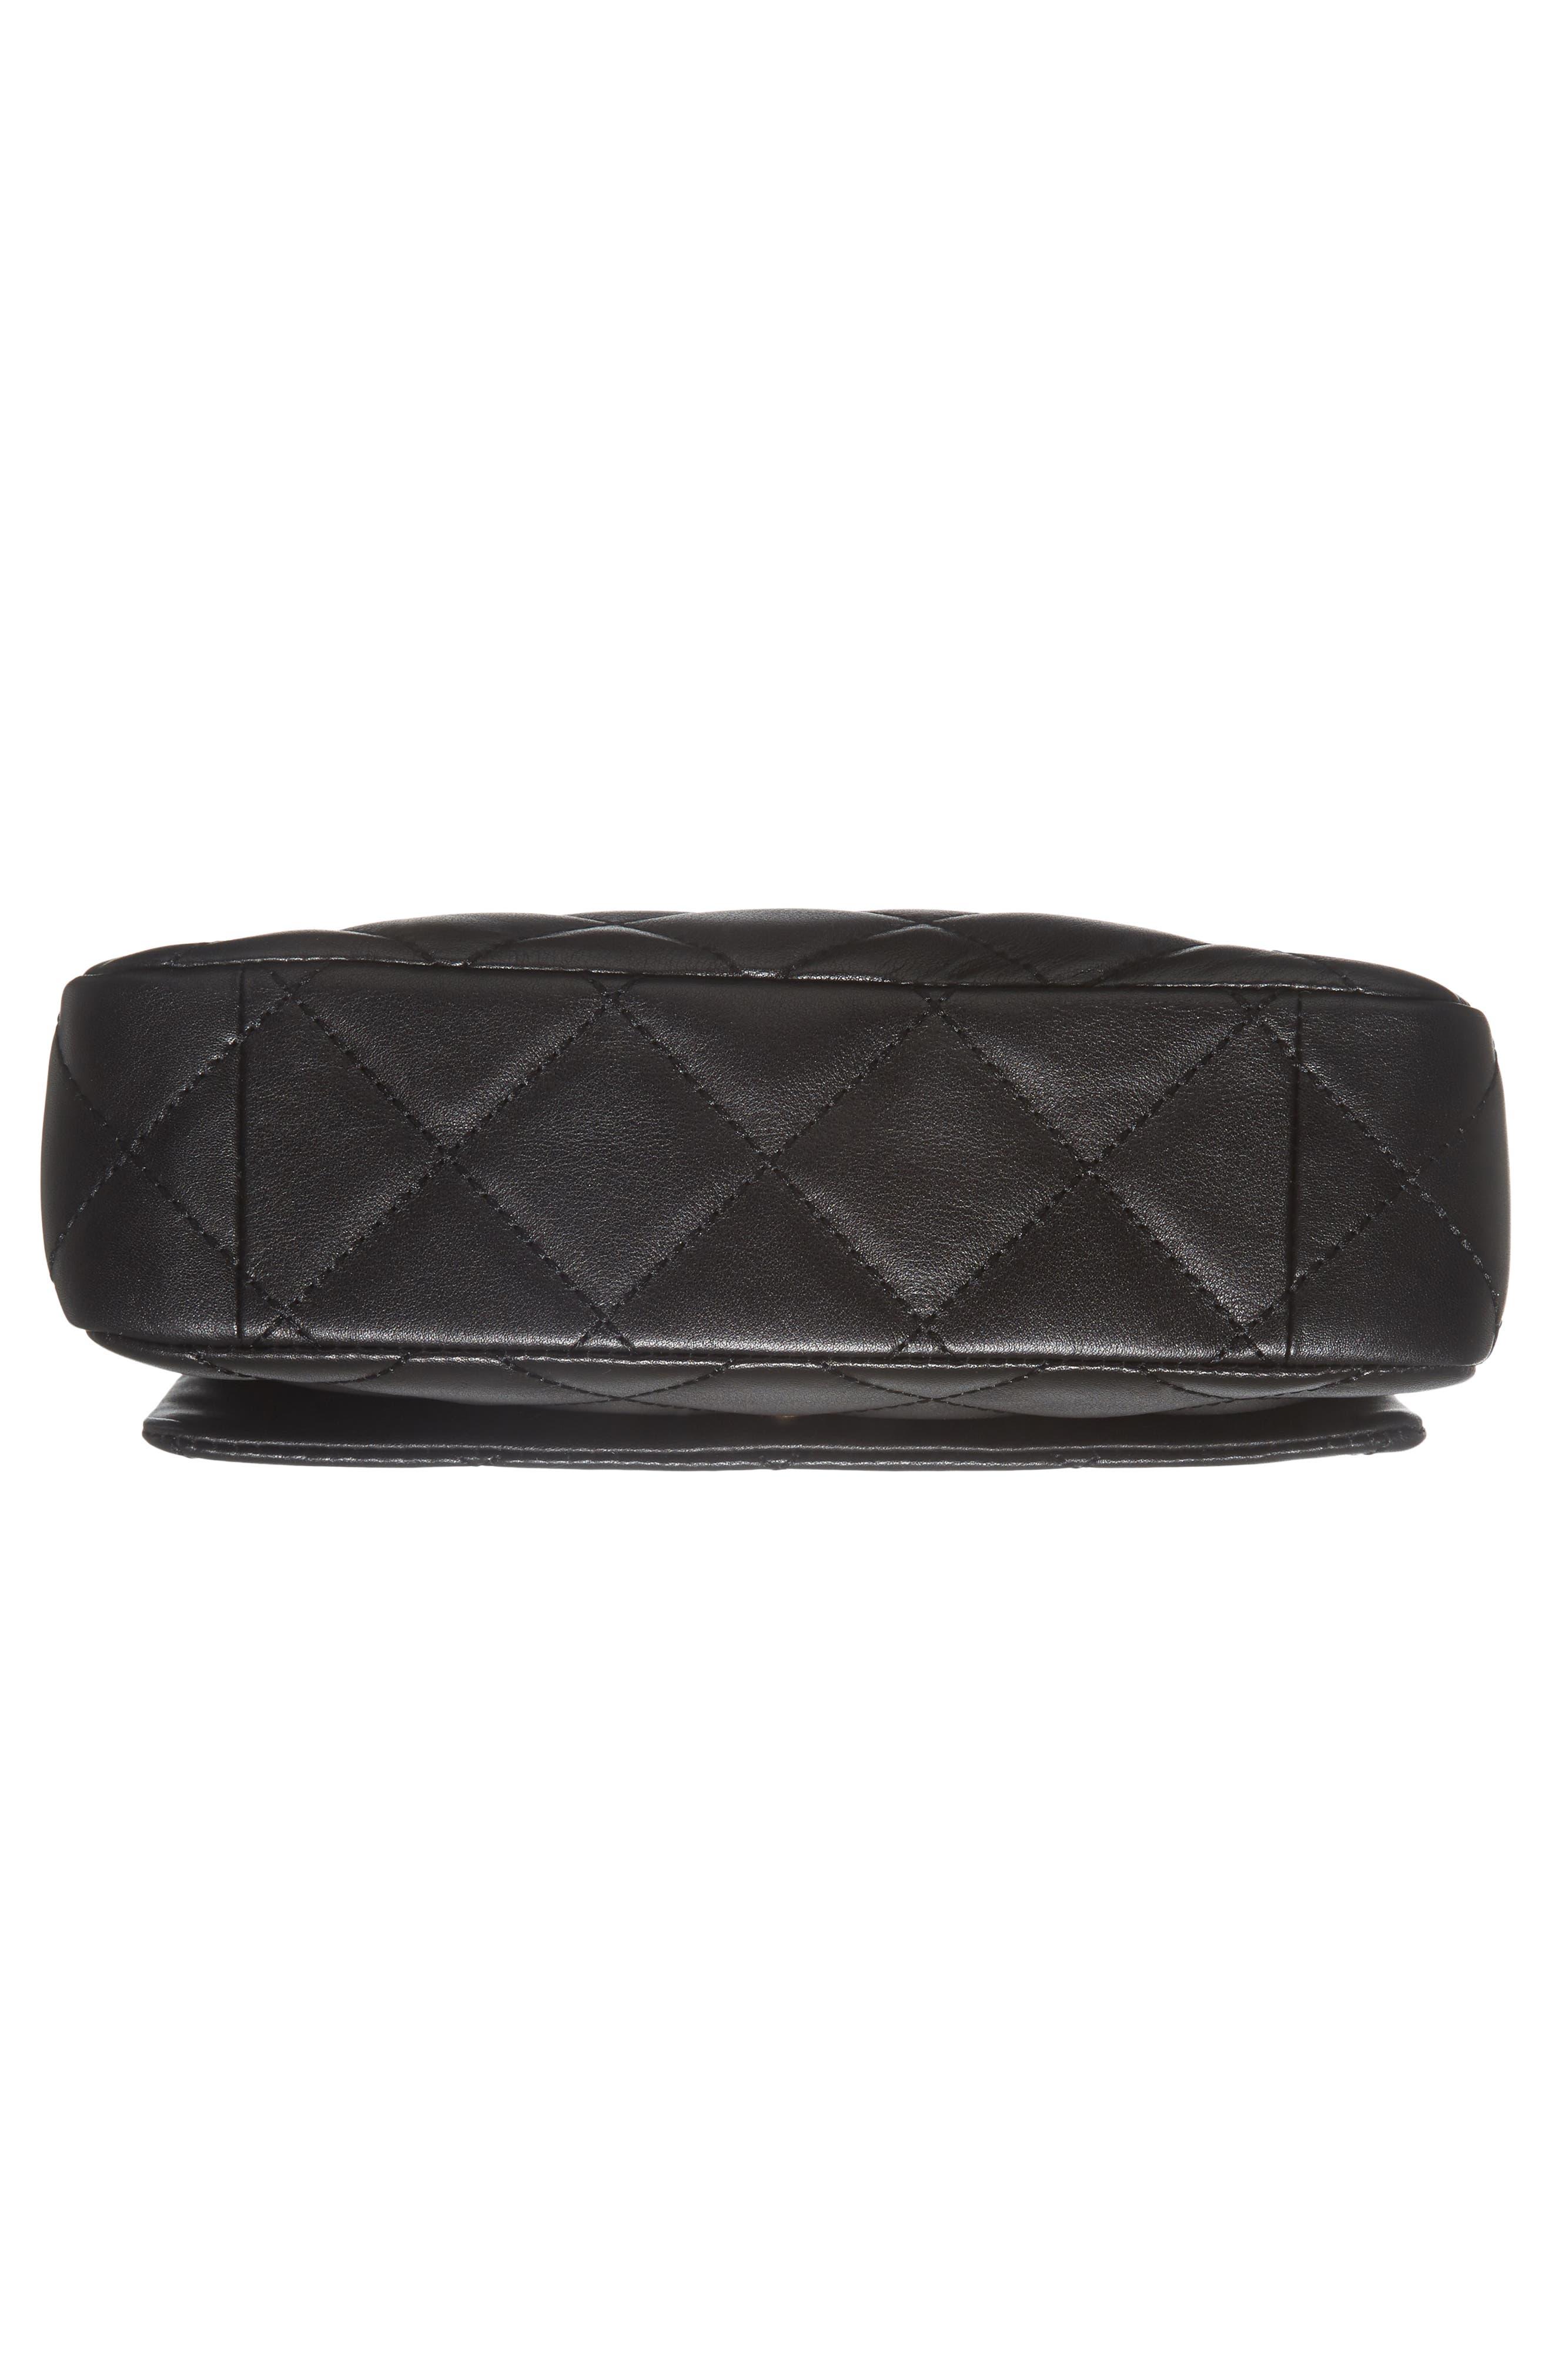 emerson place - serena leather shoulder bag,                             Alternate thumbnail 6, color,                             001